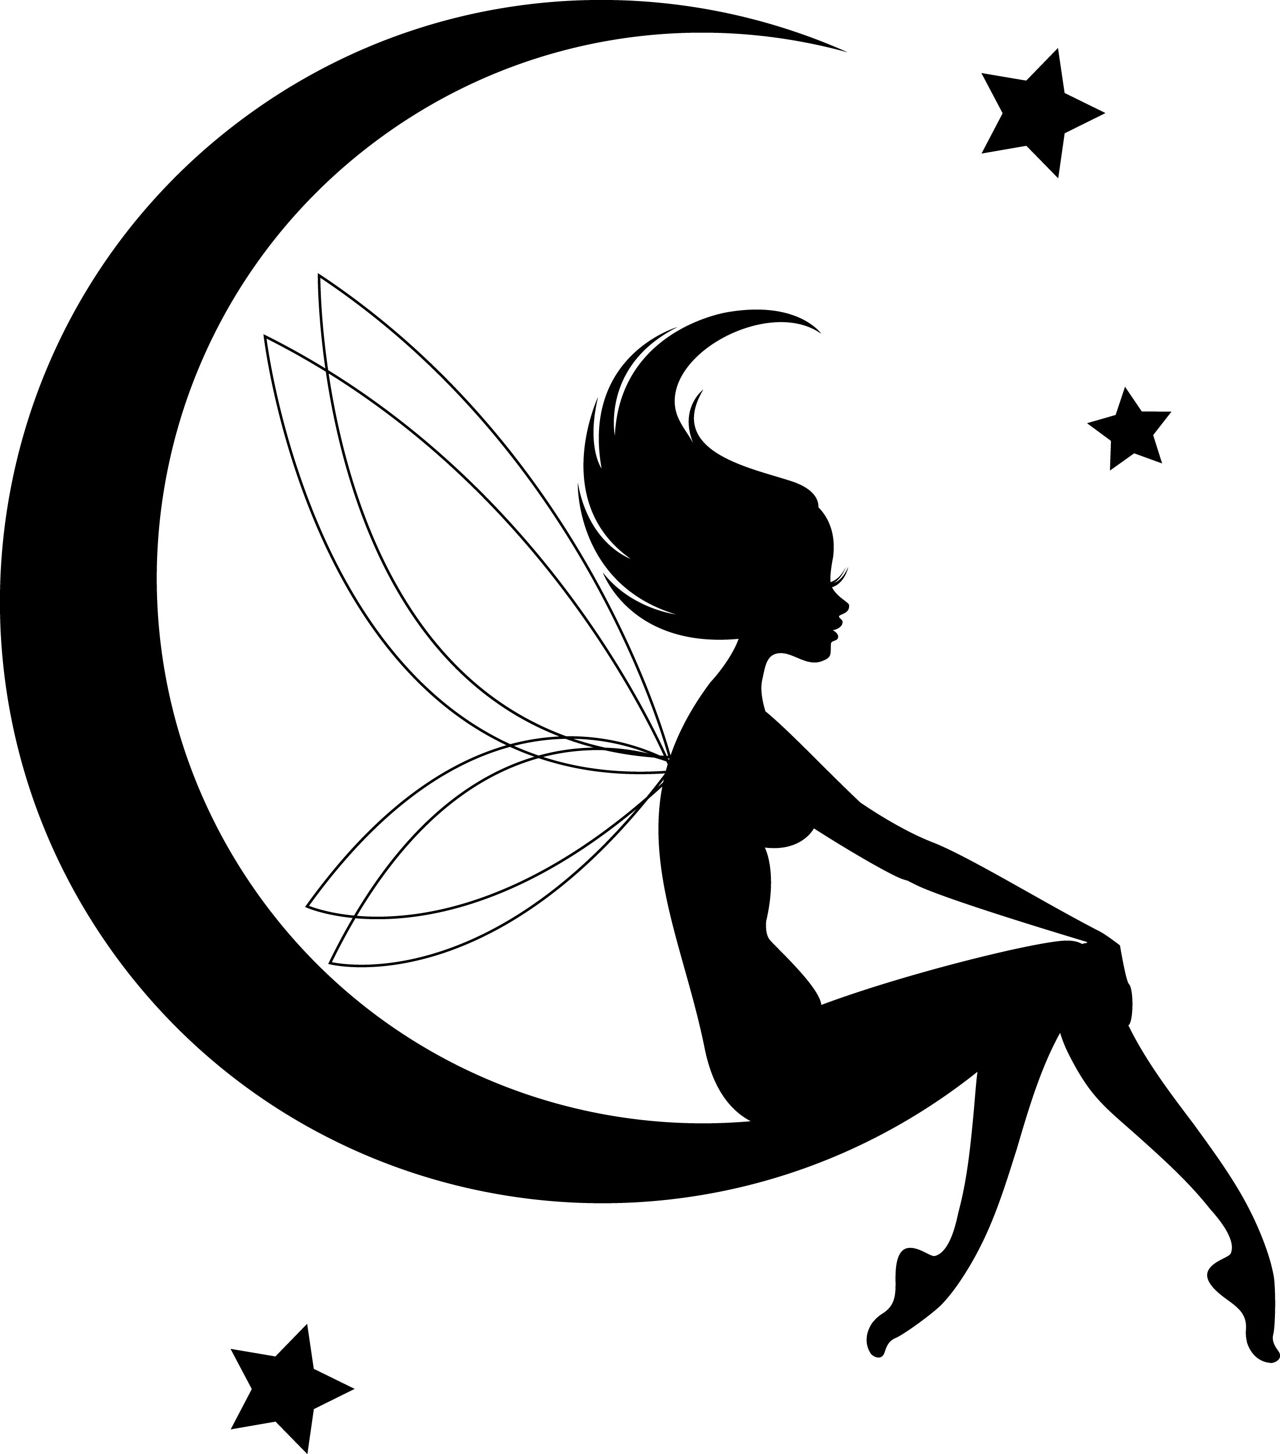 Simple Fairy Silhouette At Getdrawings